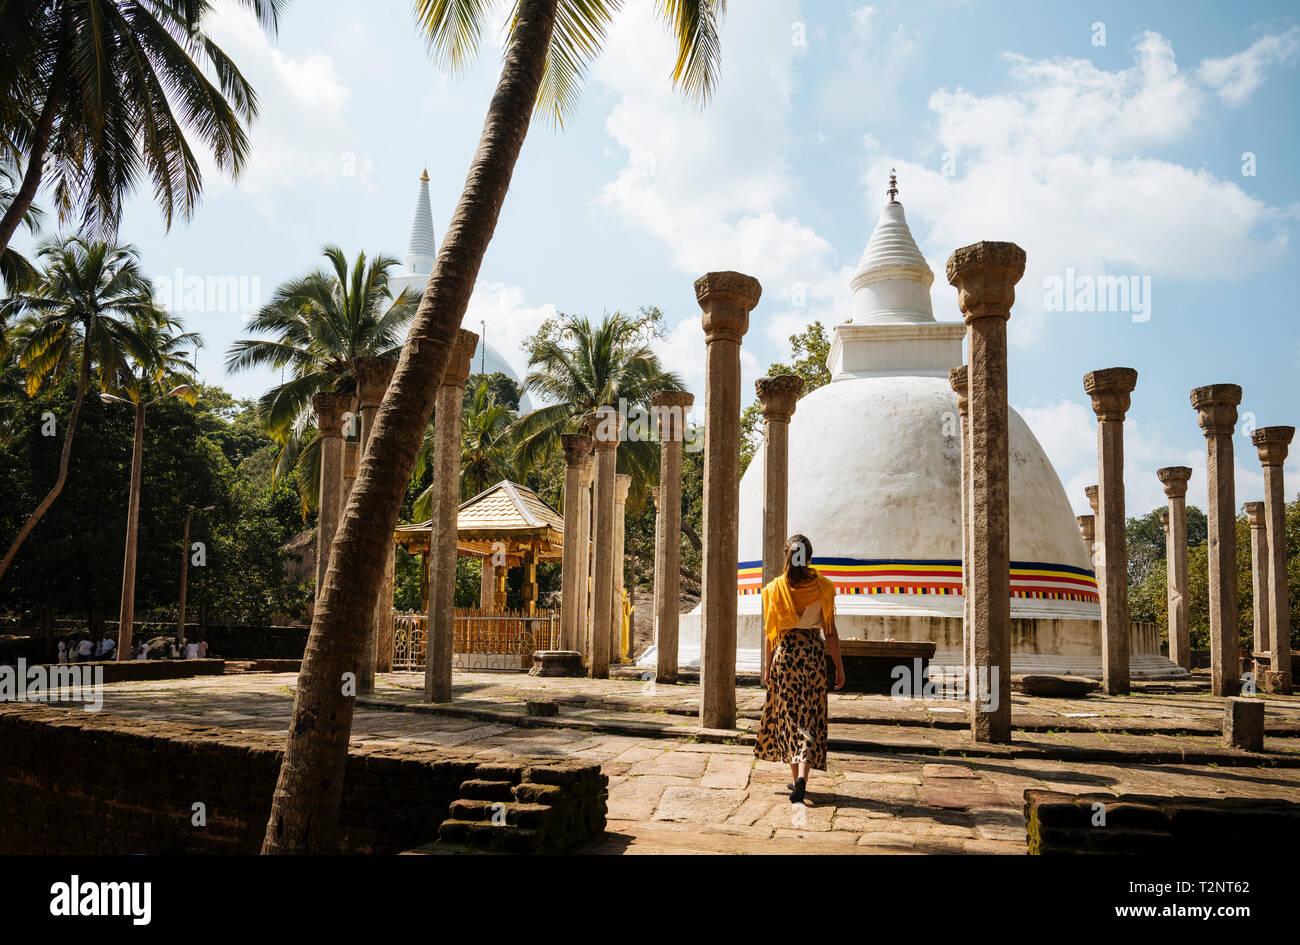 Woman at Ambasthala Dagaba, Mihintale, North Central Province, Sri Lanka Stock Photo